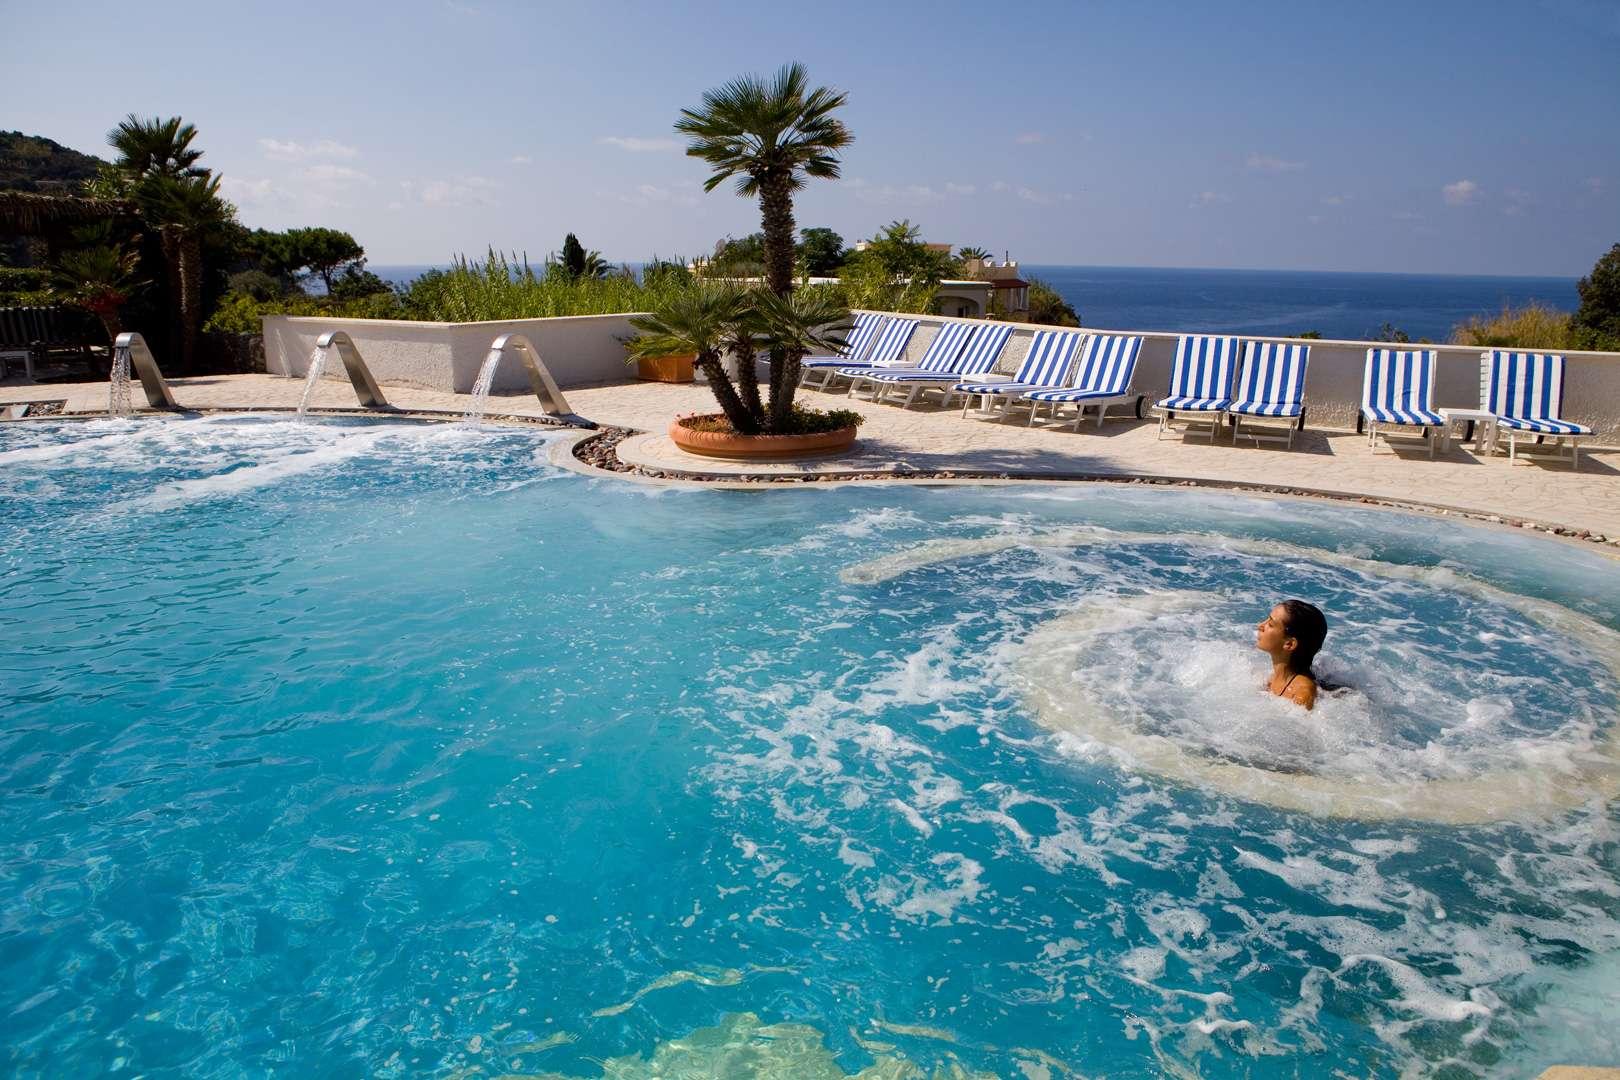 Terme spa hotel sant 39 angelo d 39 ischia san michele - Piscina san giuliano terme orari ...